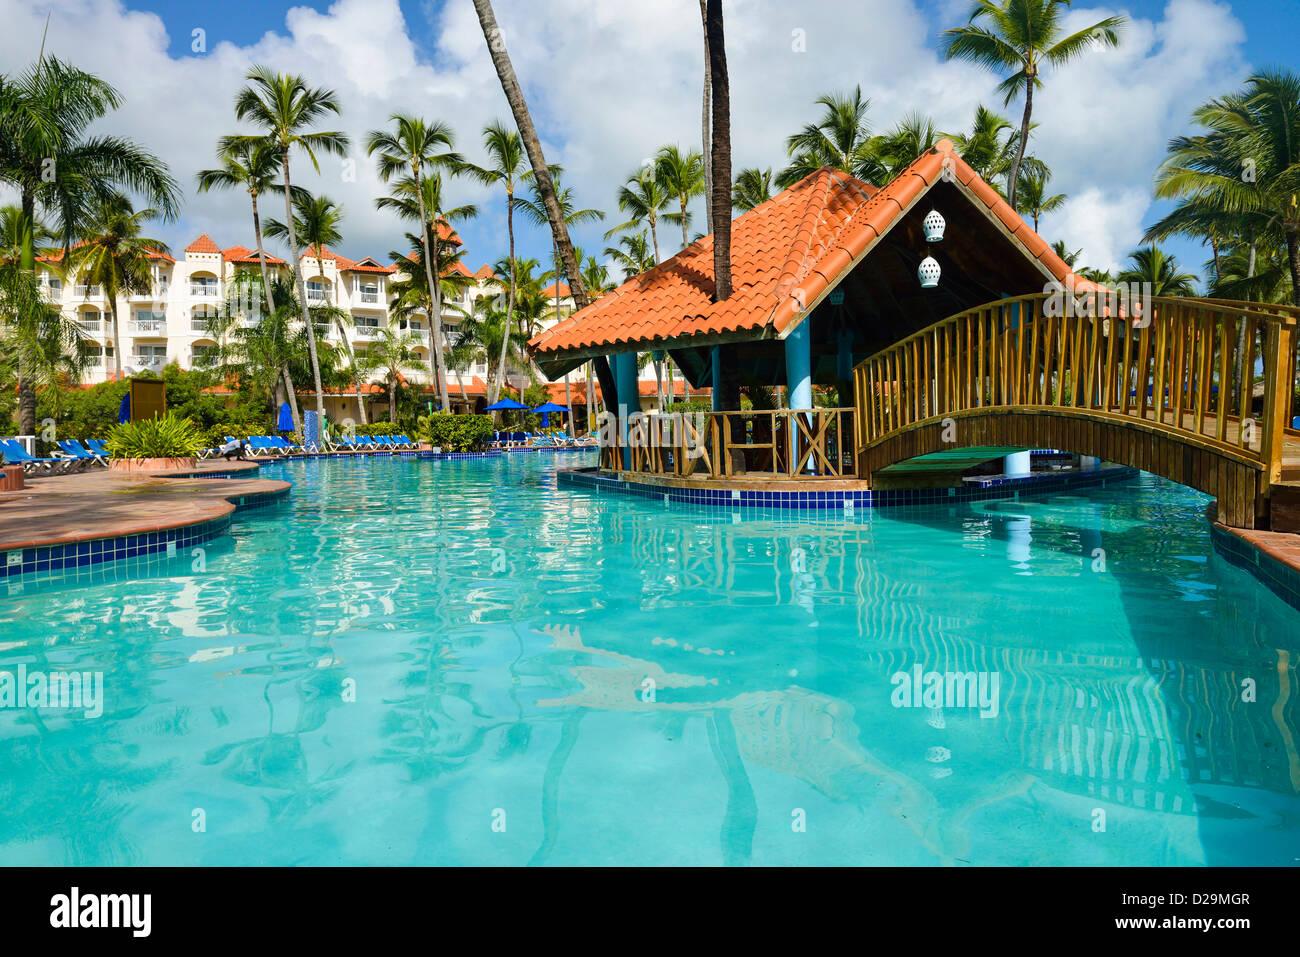 Barcelo hotel resort punta cana dominican republic stock for Punta cana dominican republic vacation